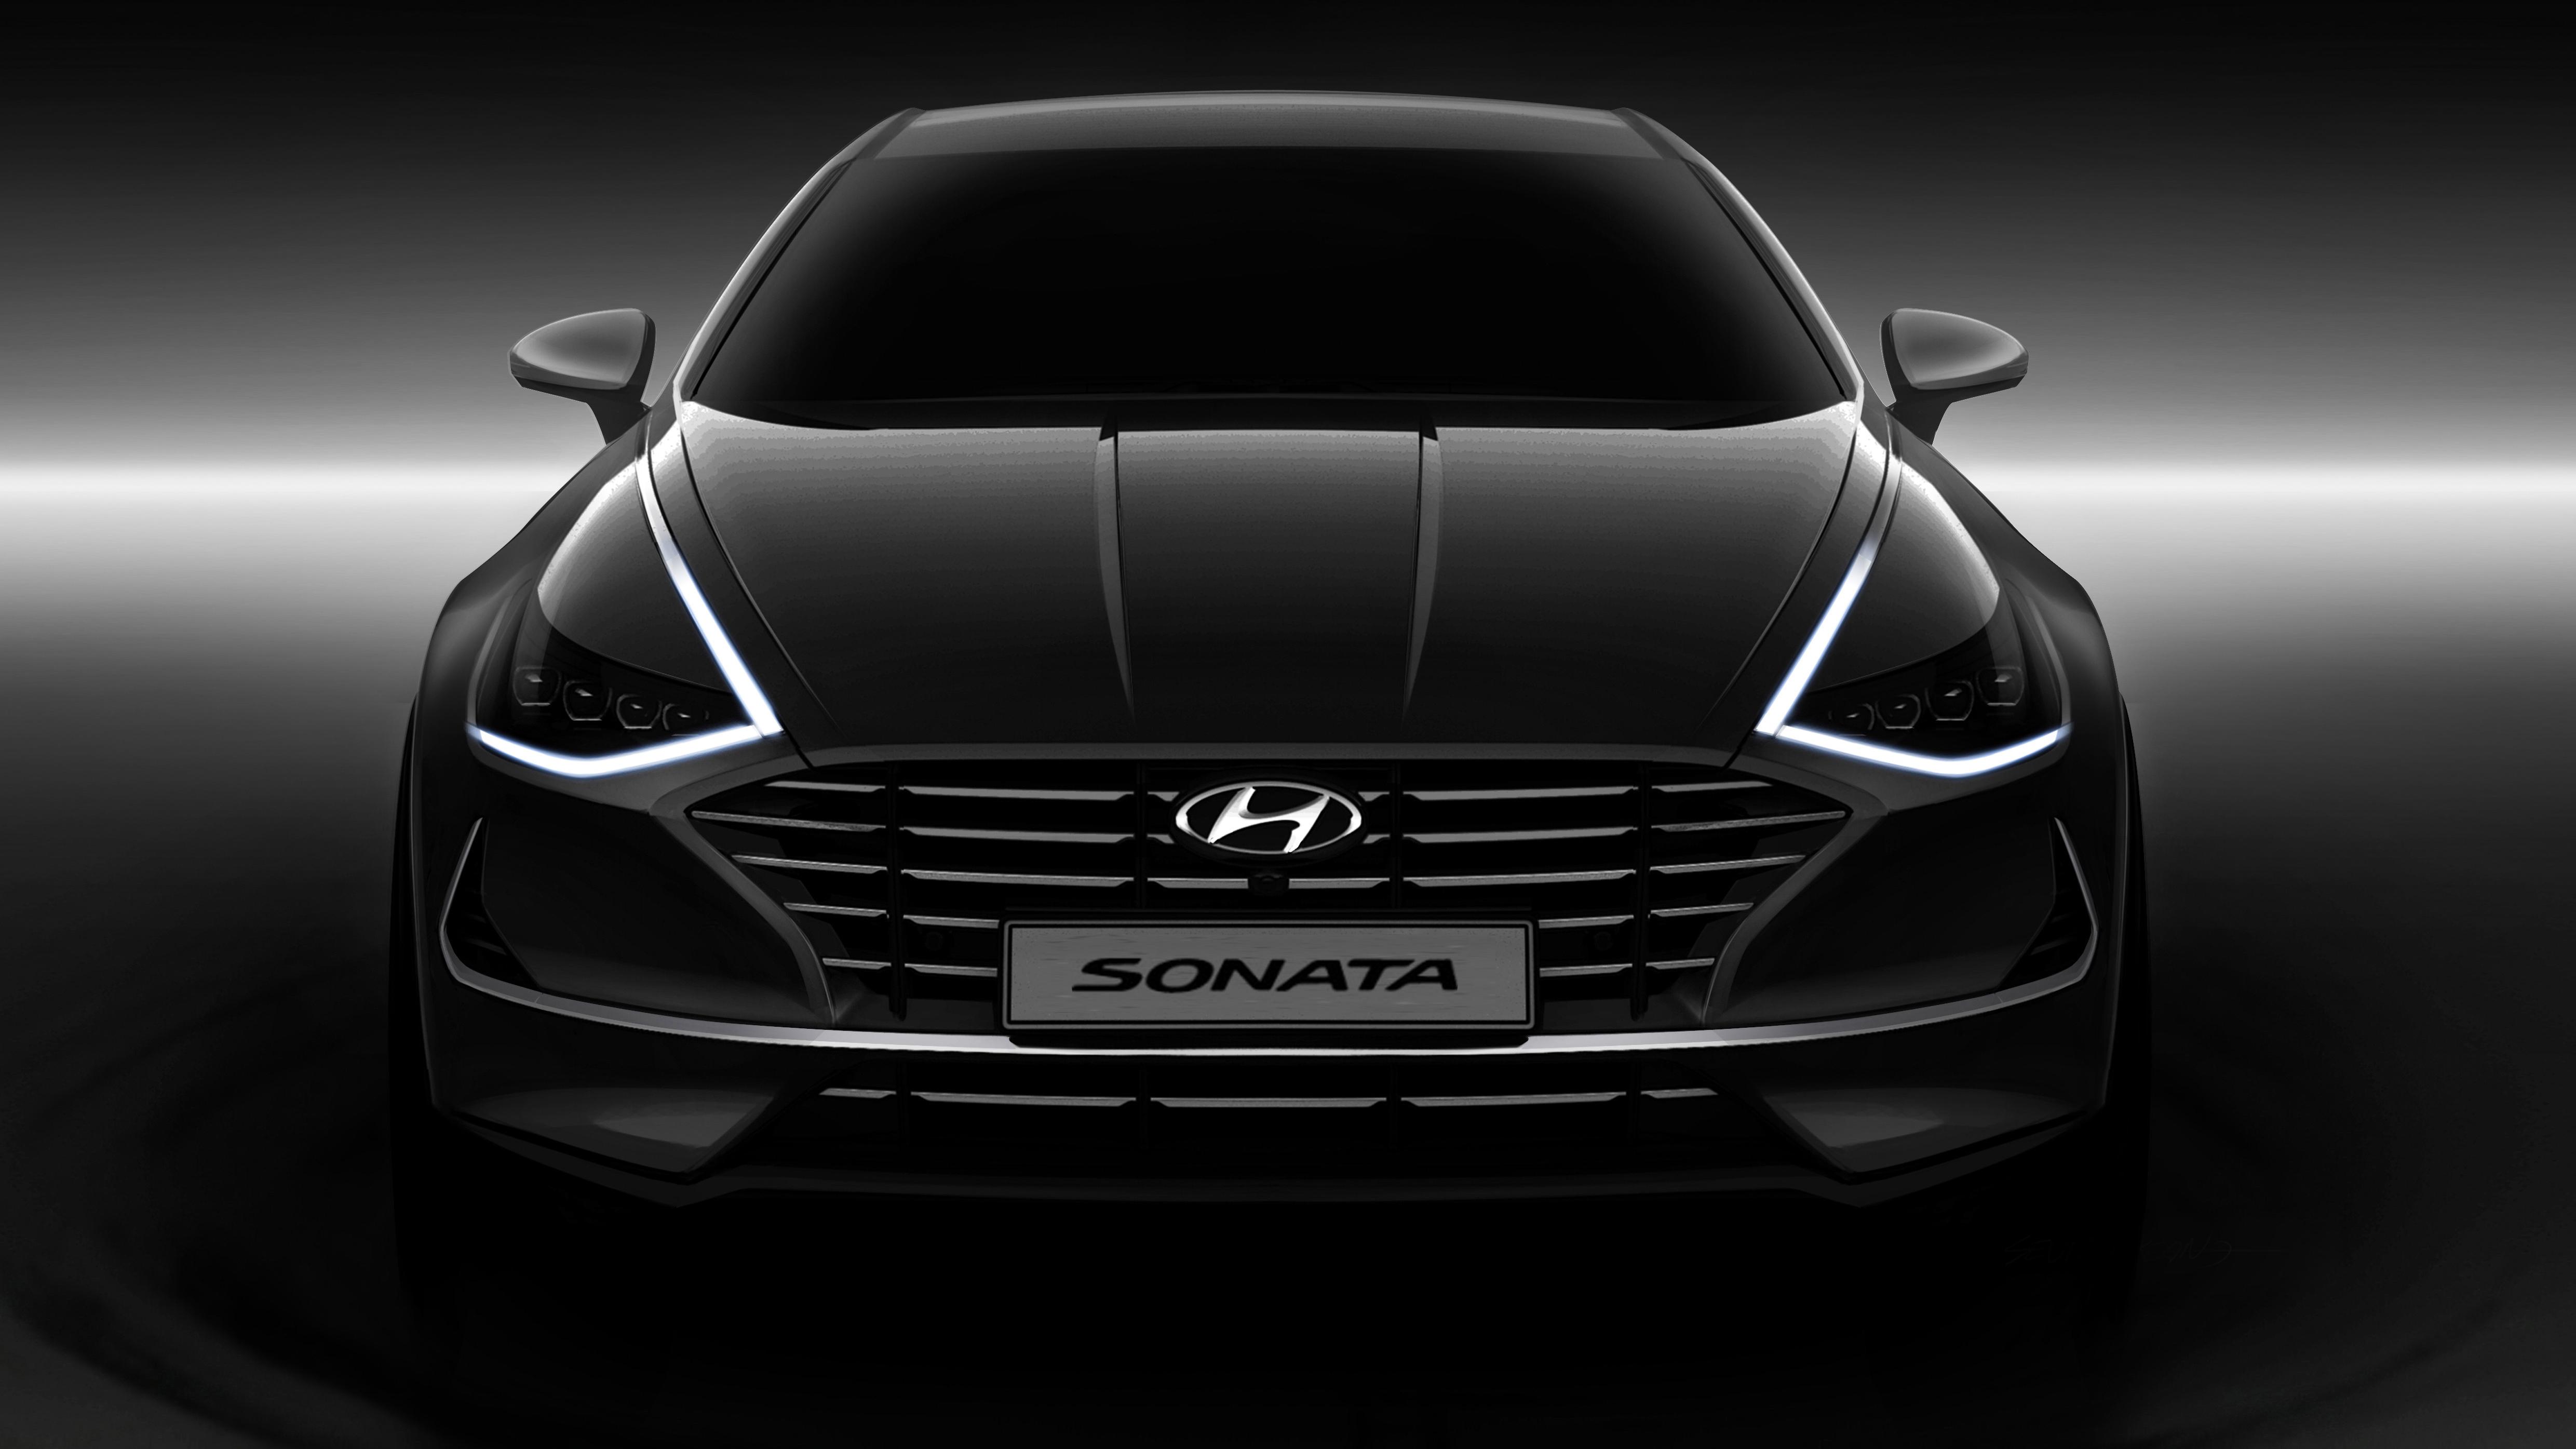 2020 Hyundai Sonata N Line Powertrain Details Revealed In The Us Caradvice